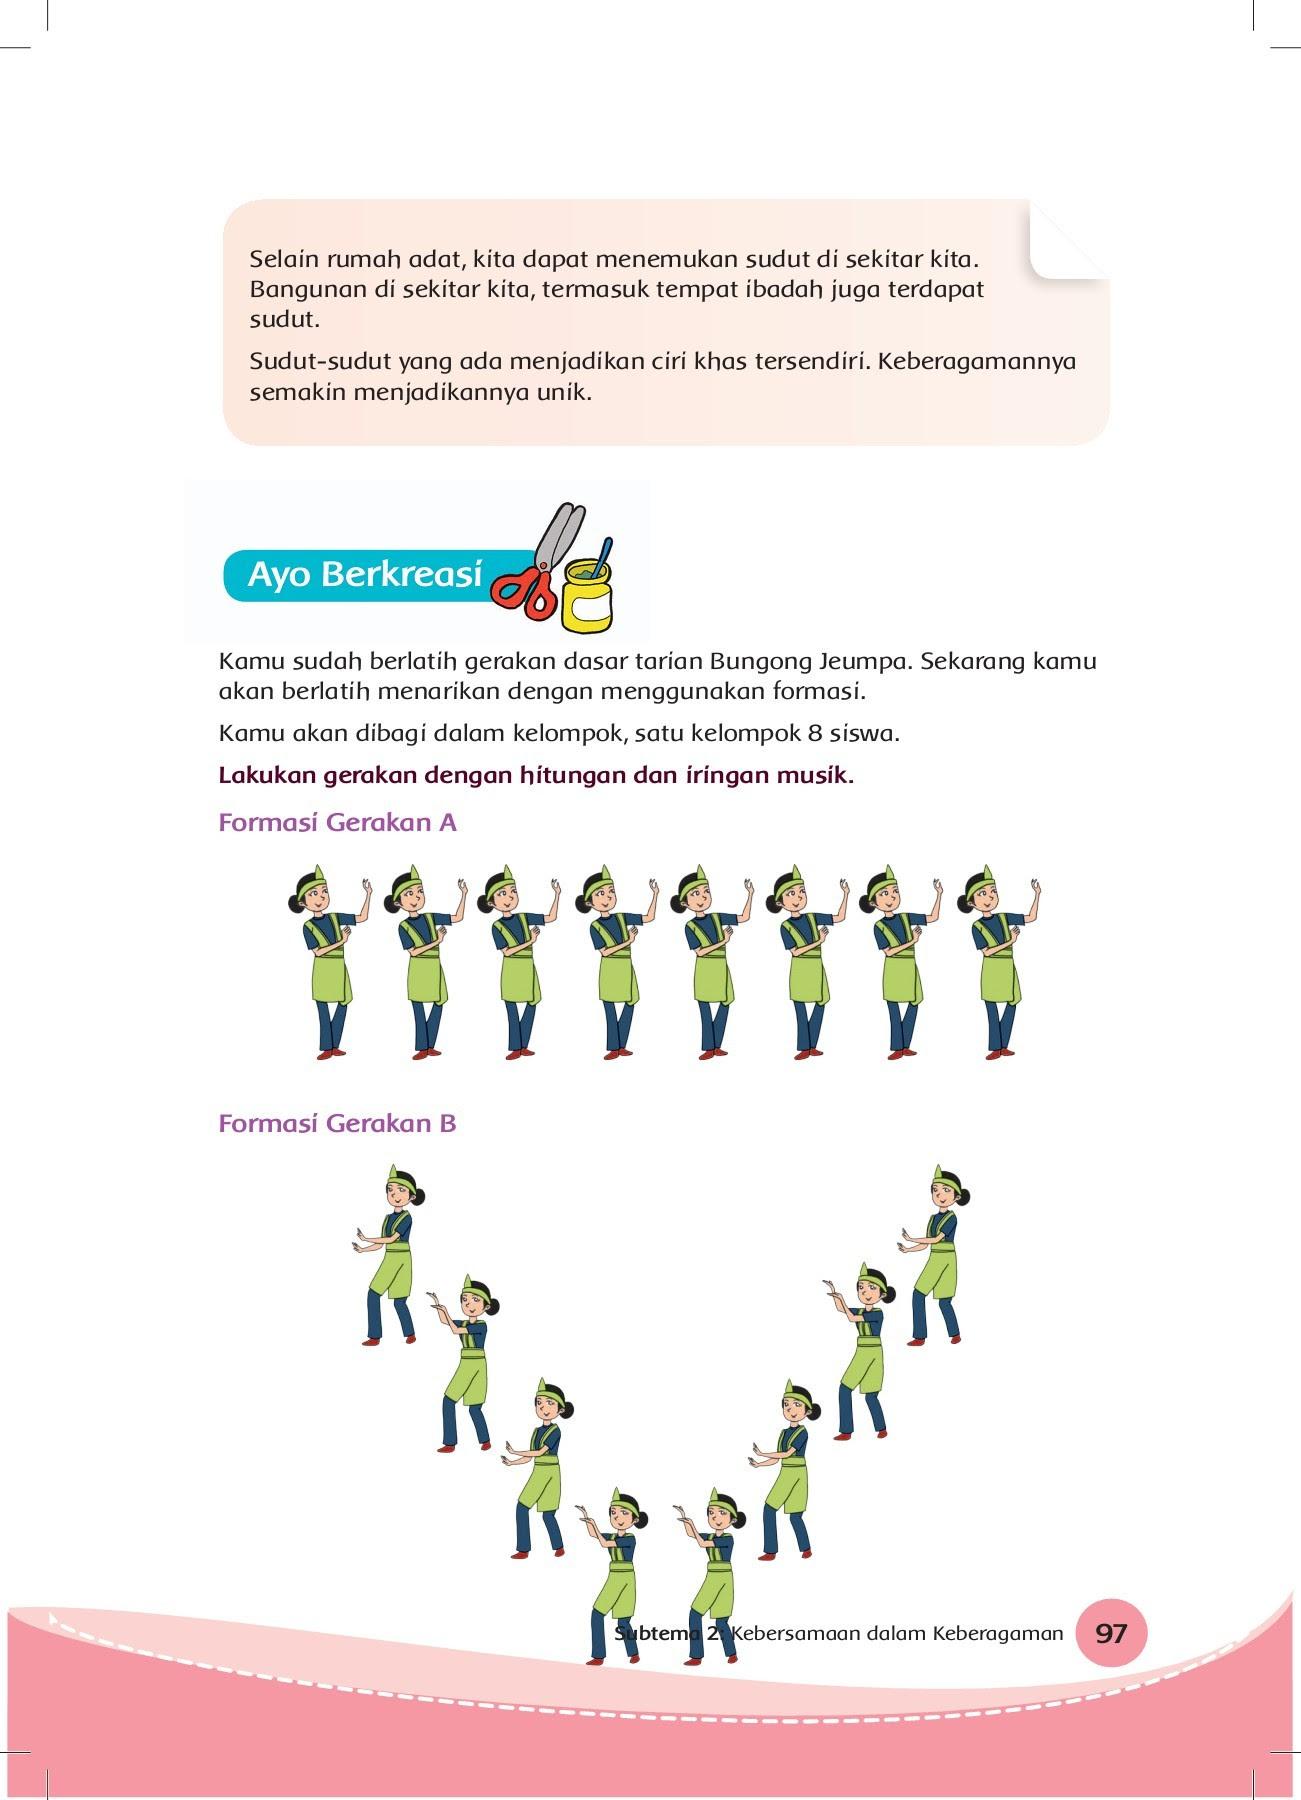 Gambar Tari Bungong Jeumpa : gambar, bungong, jeumpa, Bungong, Jeumpa, Termasuk, Jenis